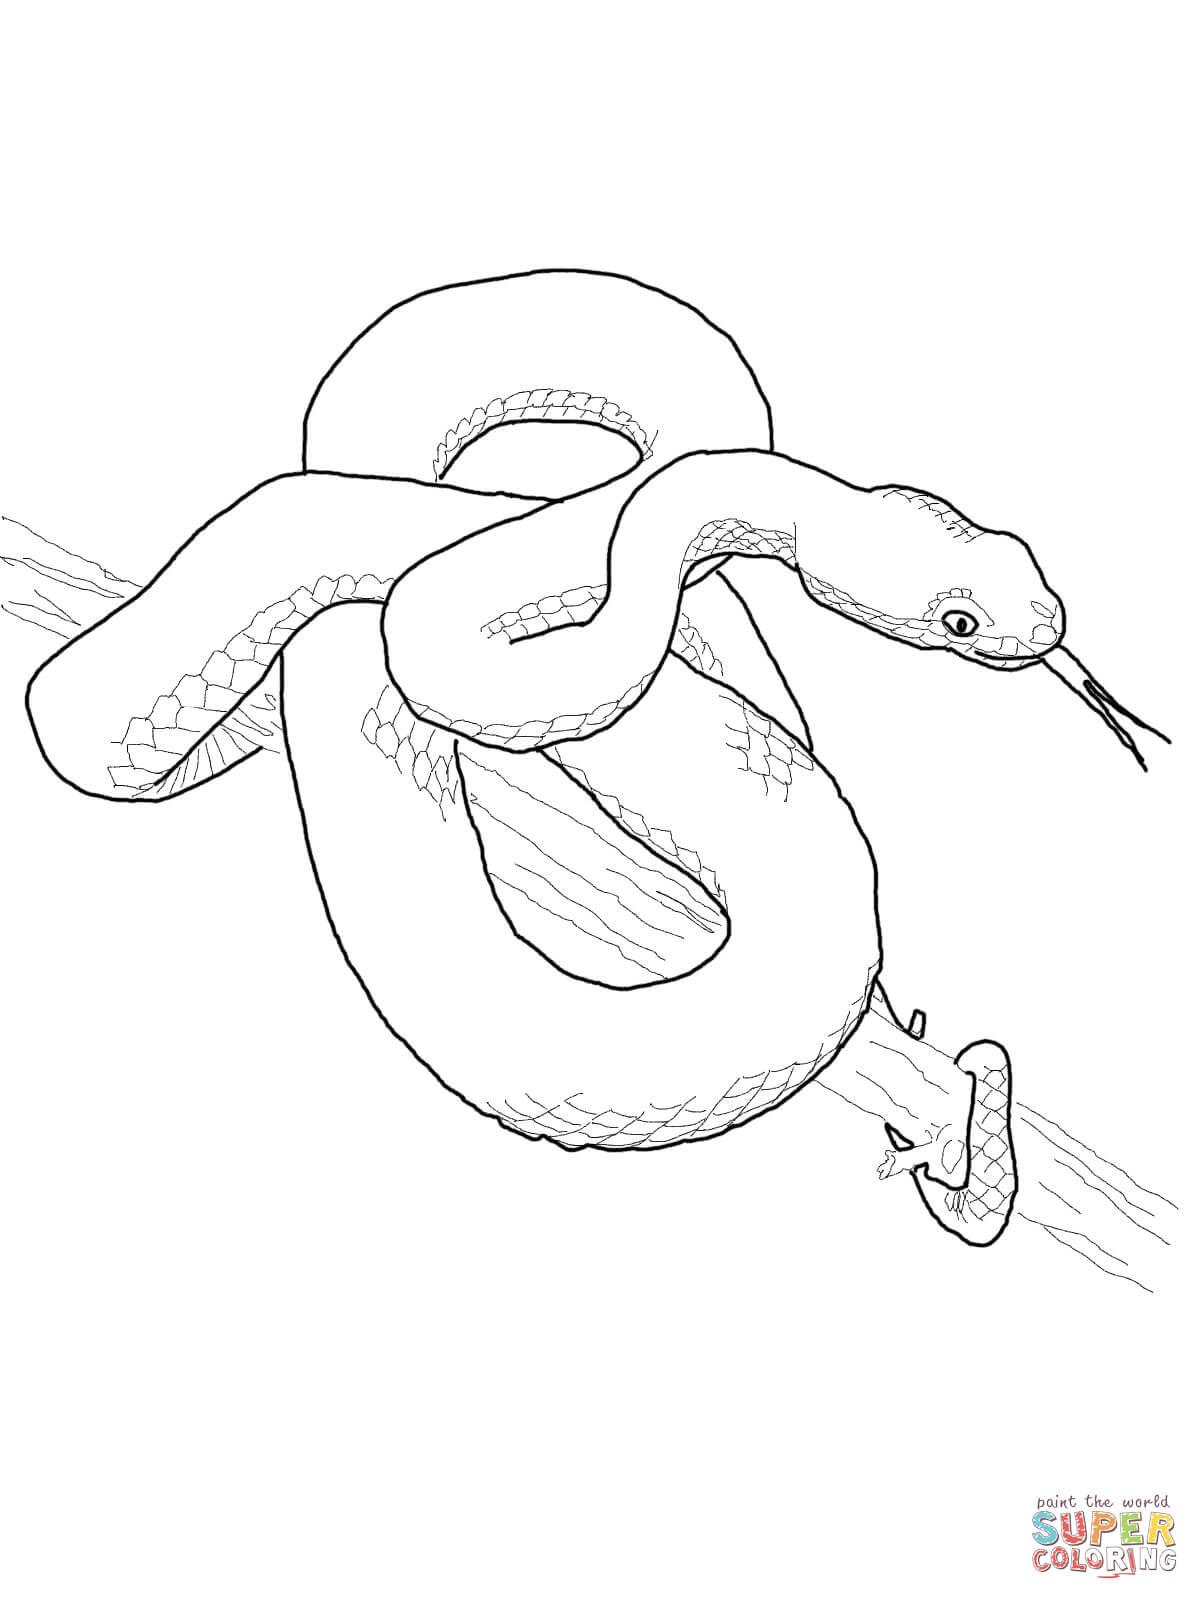 Tree Snake coloring #7, Download drawings